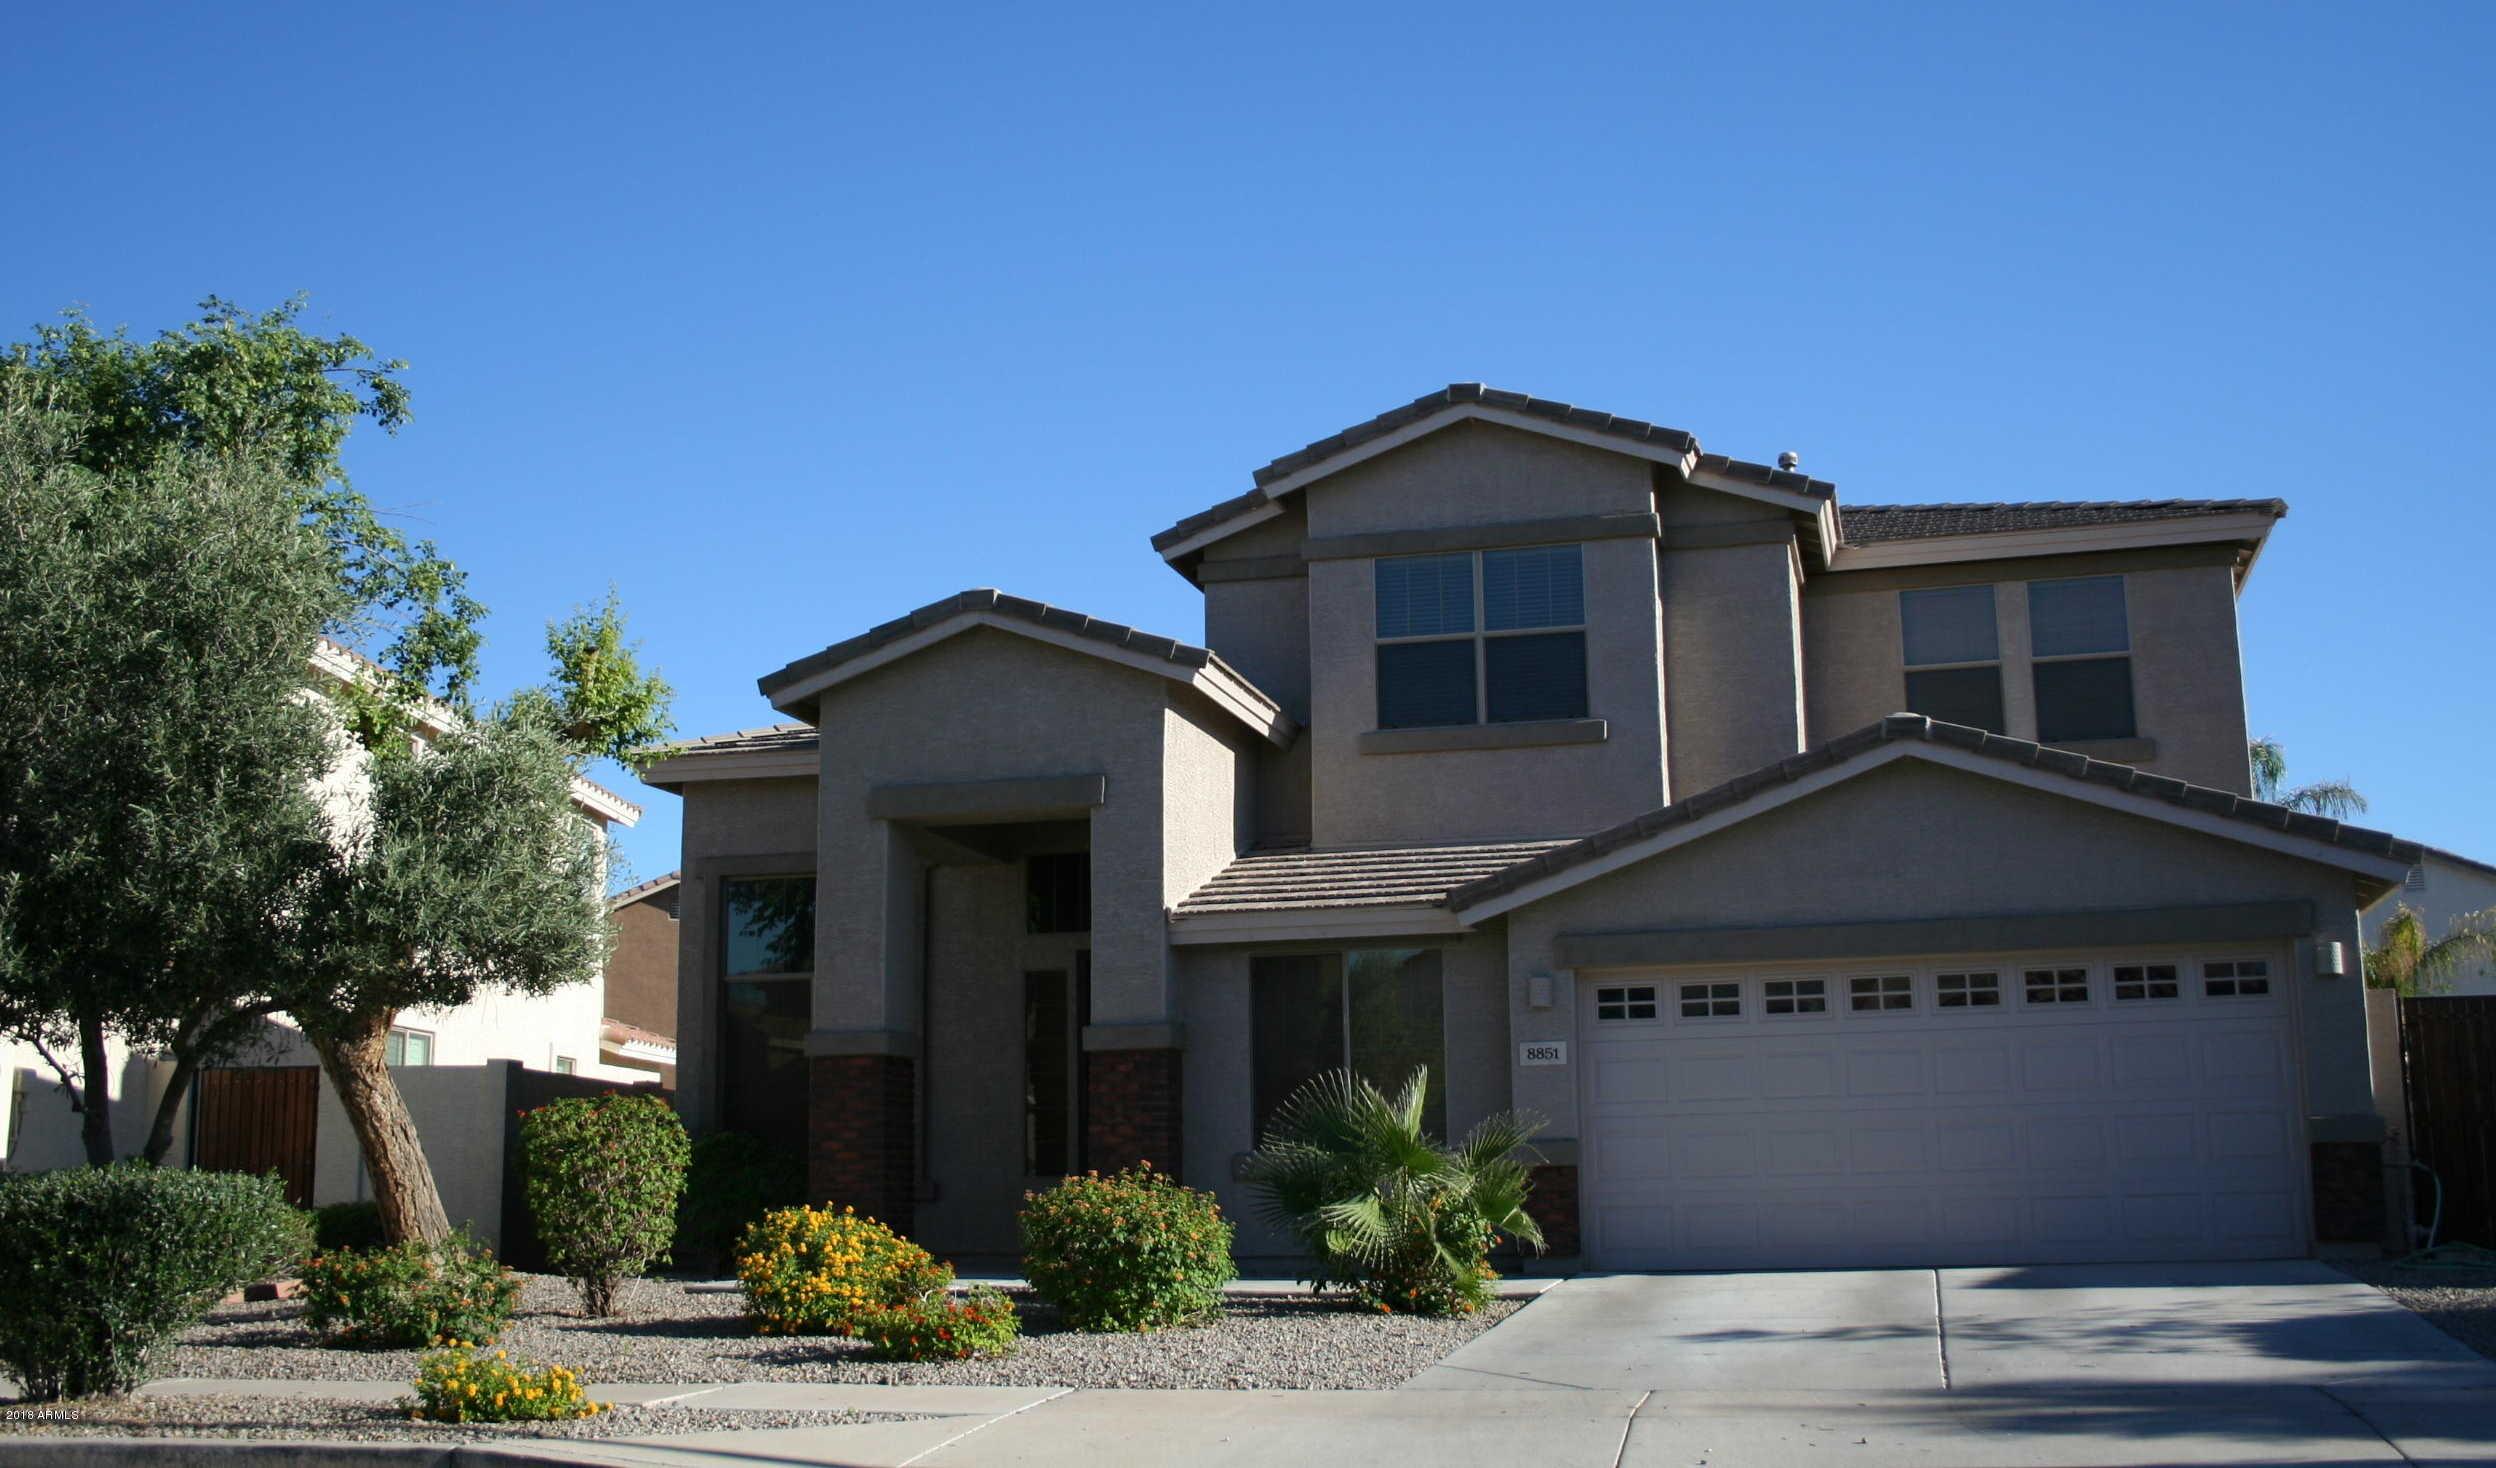 $317,000 - 4Br/3Ba - Home for Sale in Rovey Farm Estates, Glendale